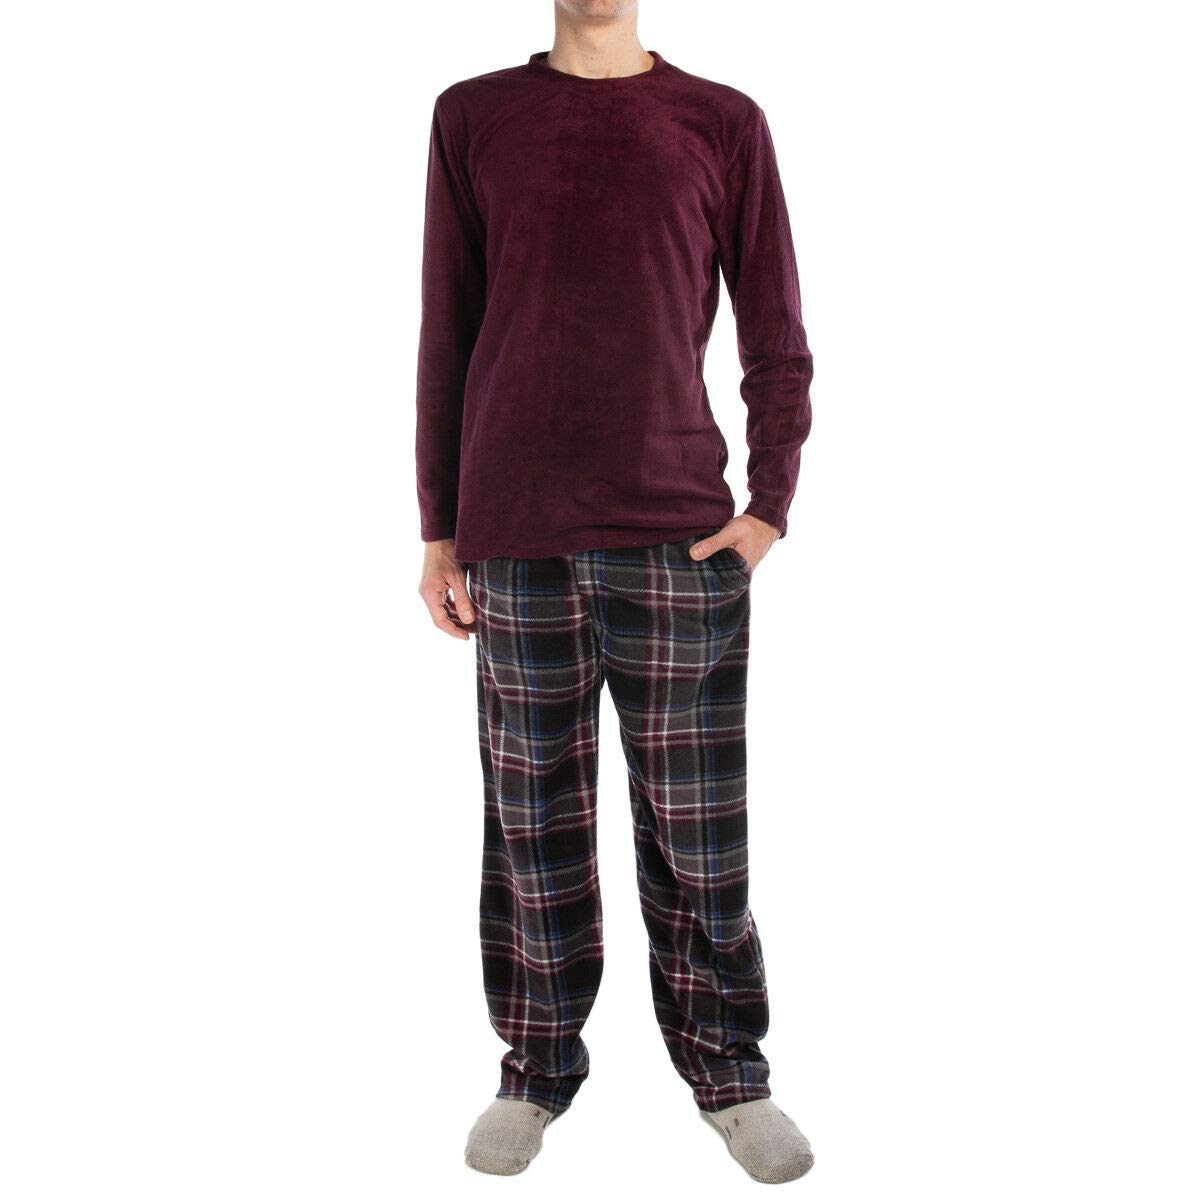 Great 2pc Joe Boxer Men/'s Fleece Pajamas Set Shirt /& Pants PJ Sleepwear Top /& Bottom Color Wine Plaid Size 4XL